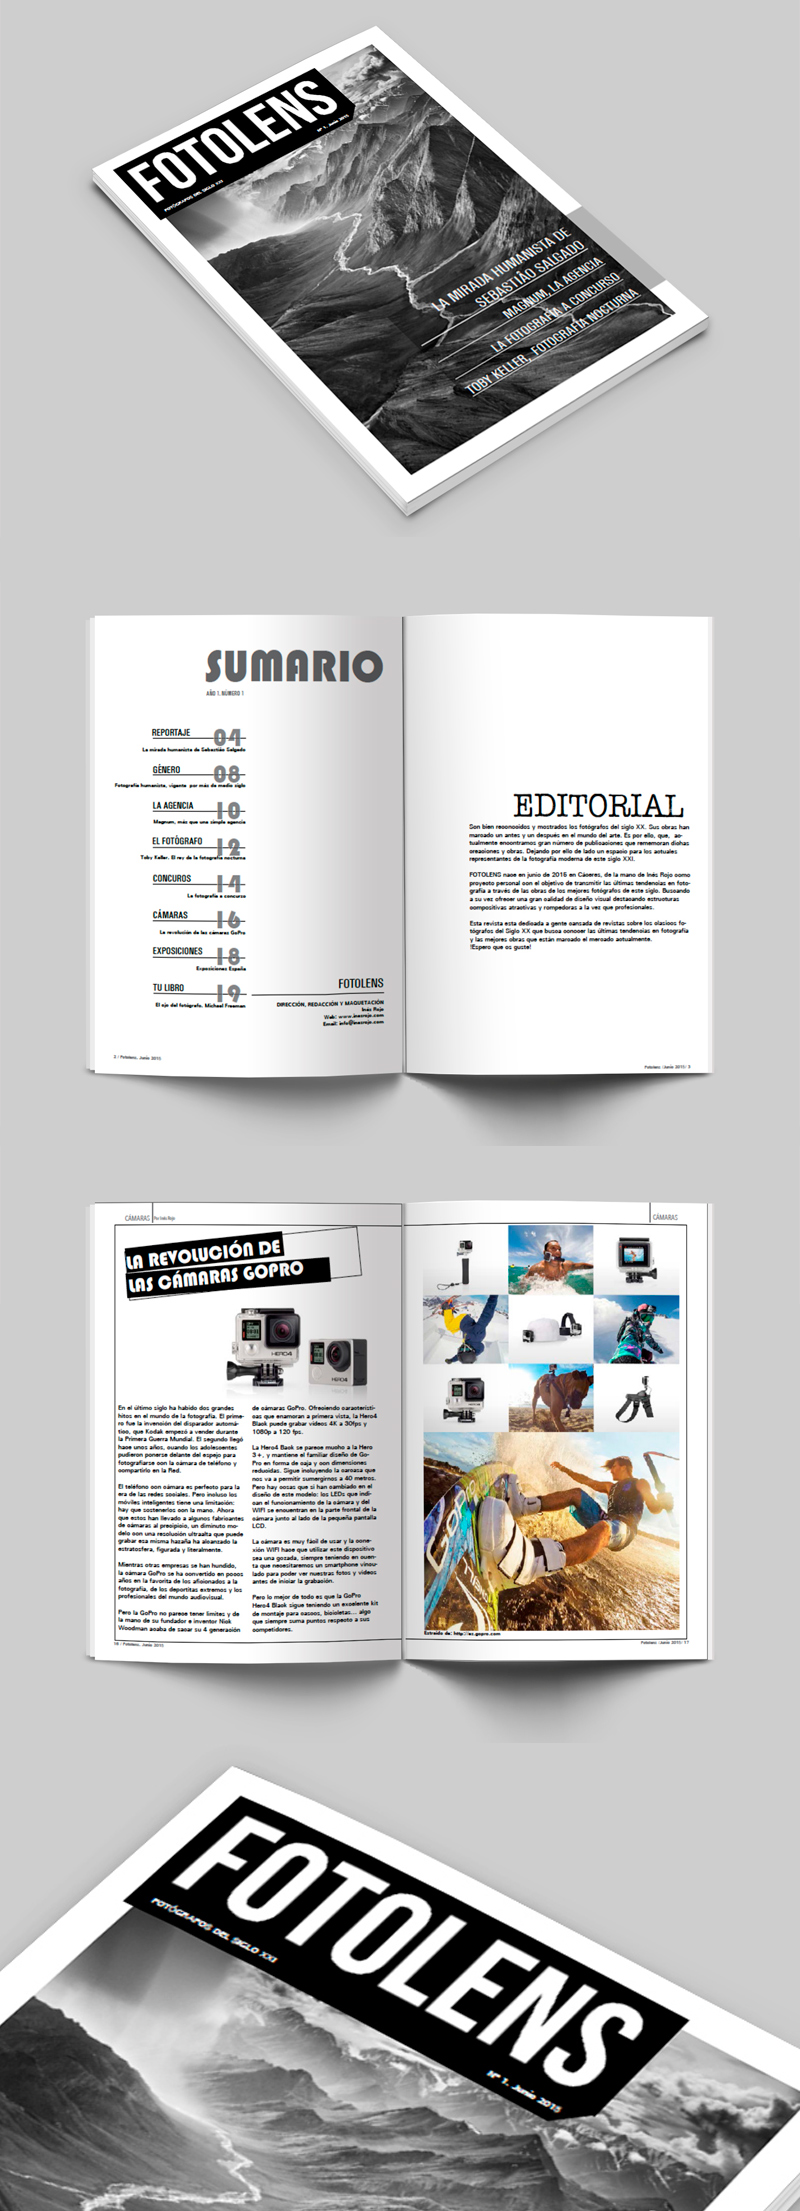 Magazine Fotolens